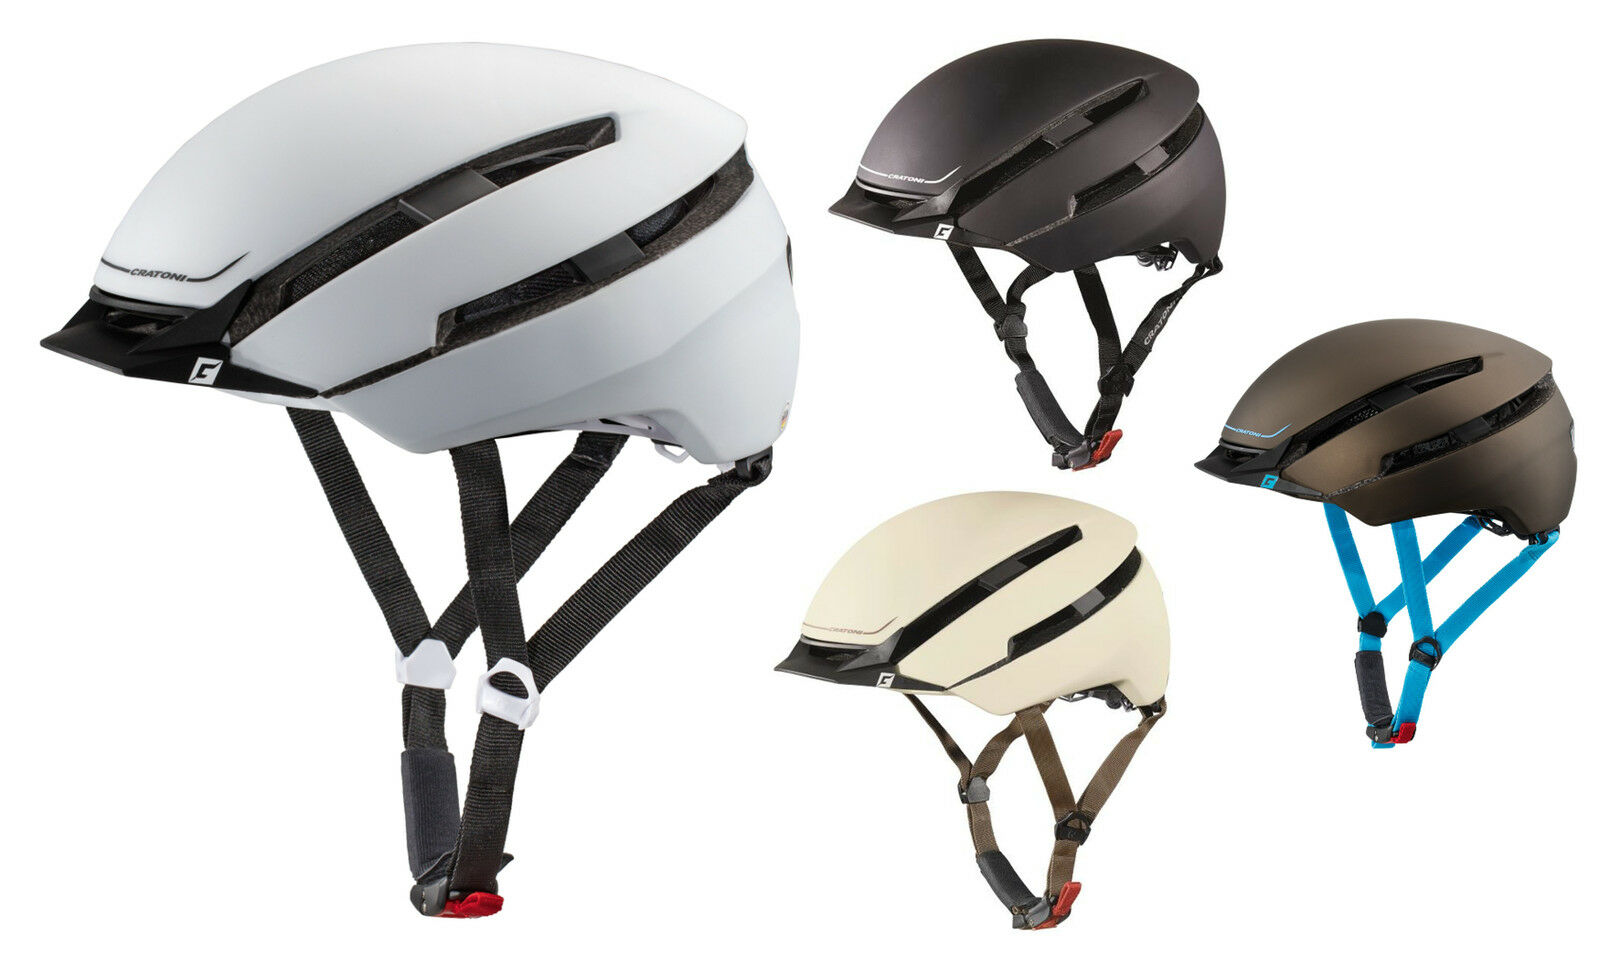 Cratoni e-bikehelm C-Loom pedelechelm City cascos casco de bicicleta cruiser radhelme